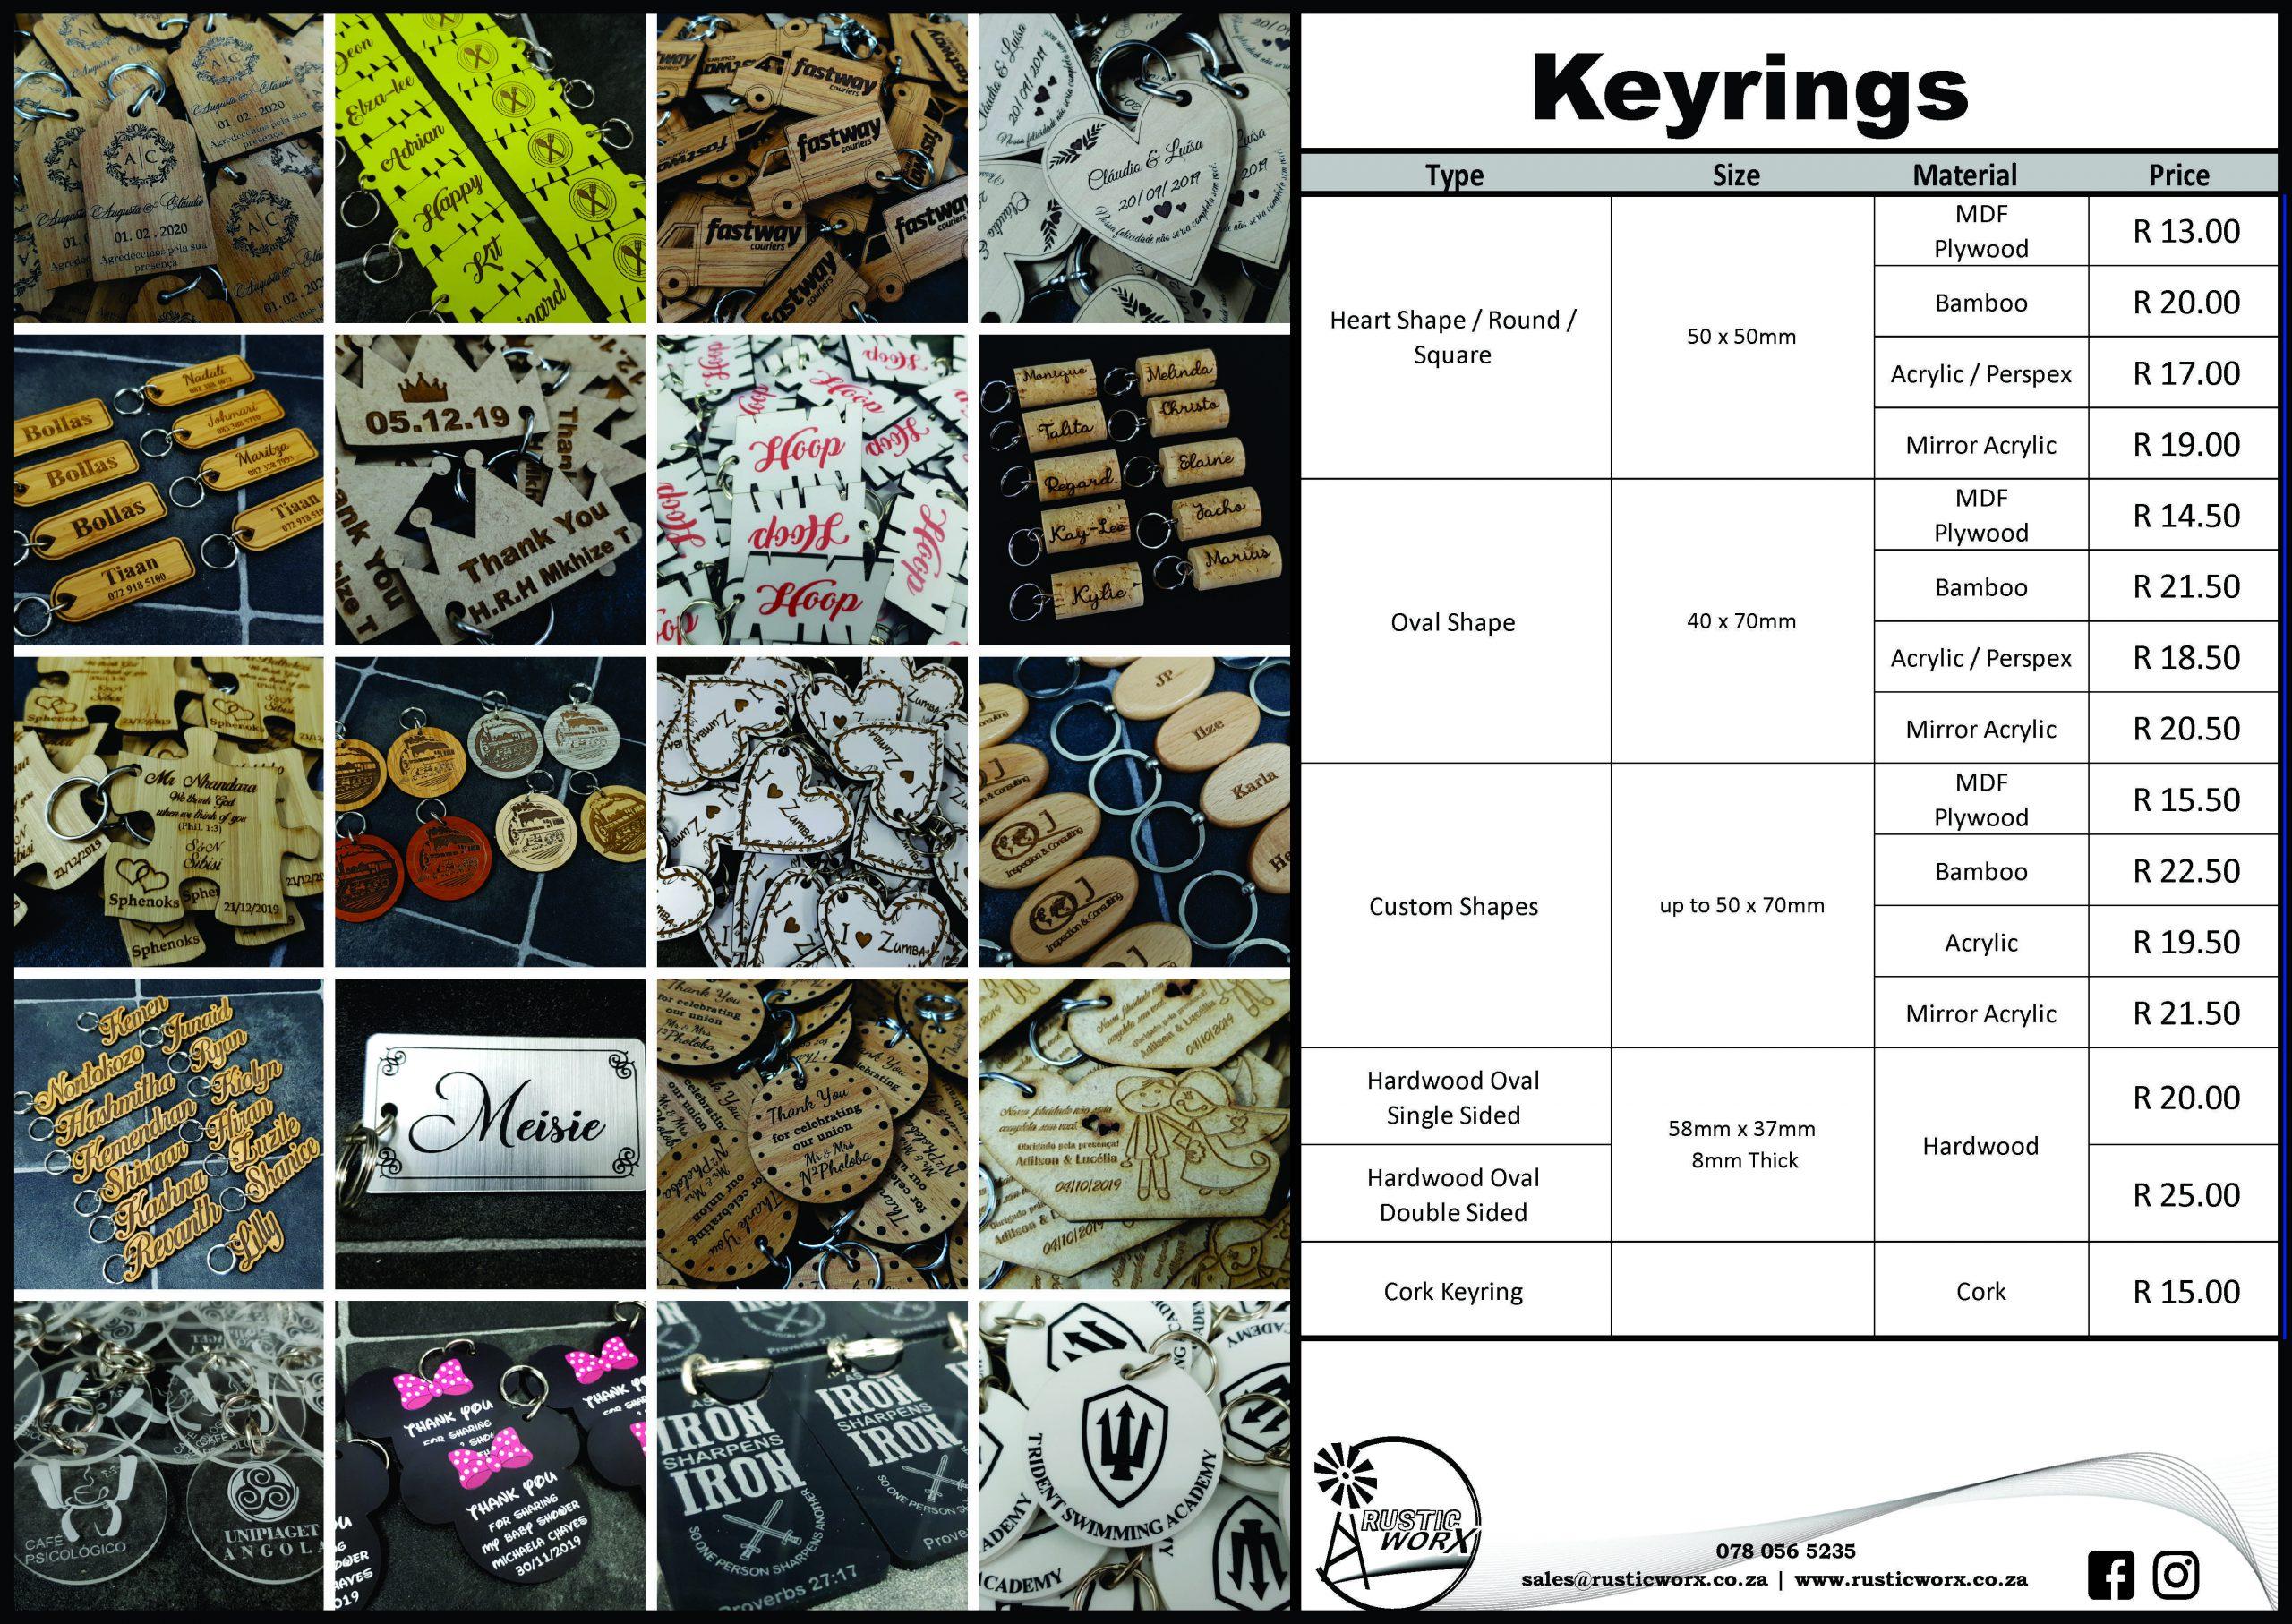 2 Keyrings